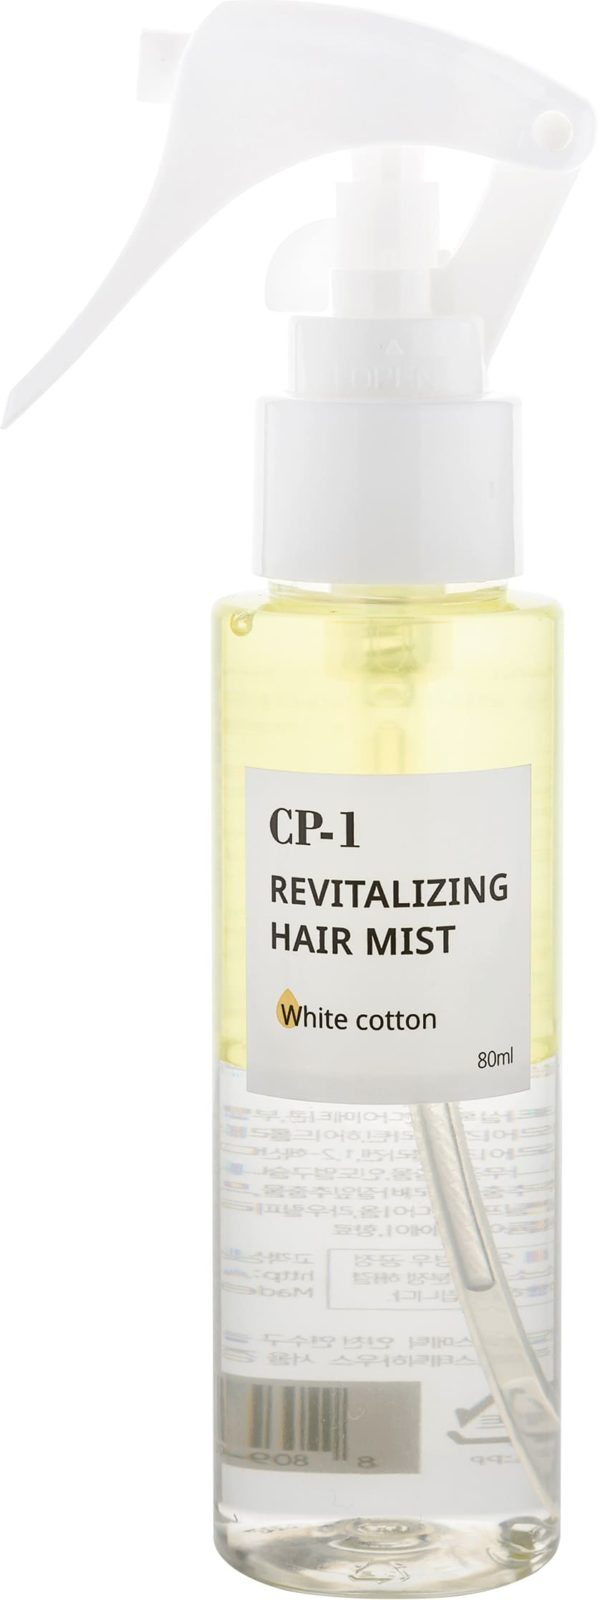 для волос ЛИМОННАЯ ВЕРБЕНА ГИАЦИНТ CP 1 Revitalizing Hair Mist - Ароматизированный мист для волос CP-1 Revitalizing Hair Mist, 80 мл